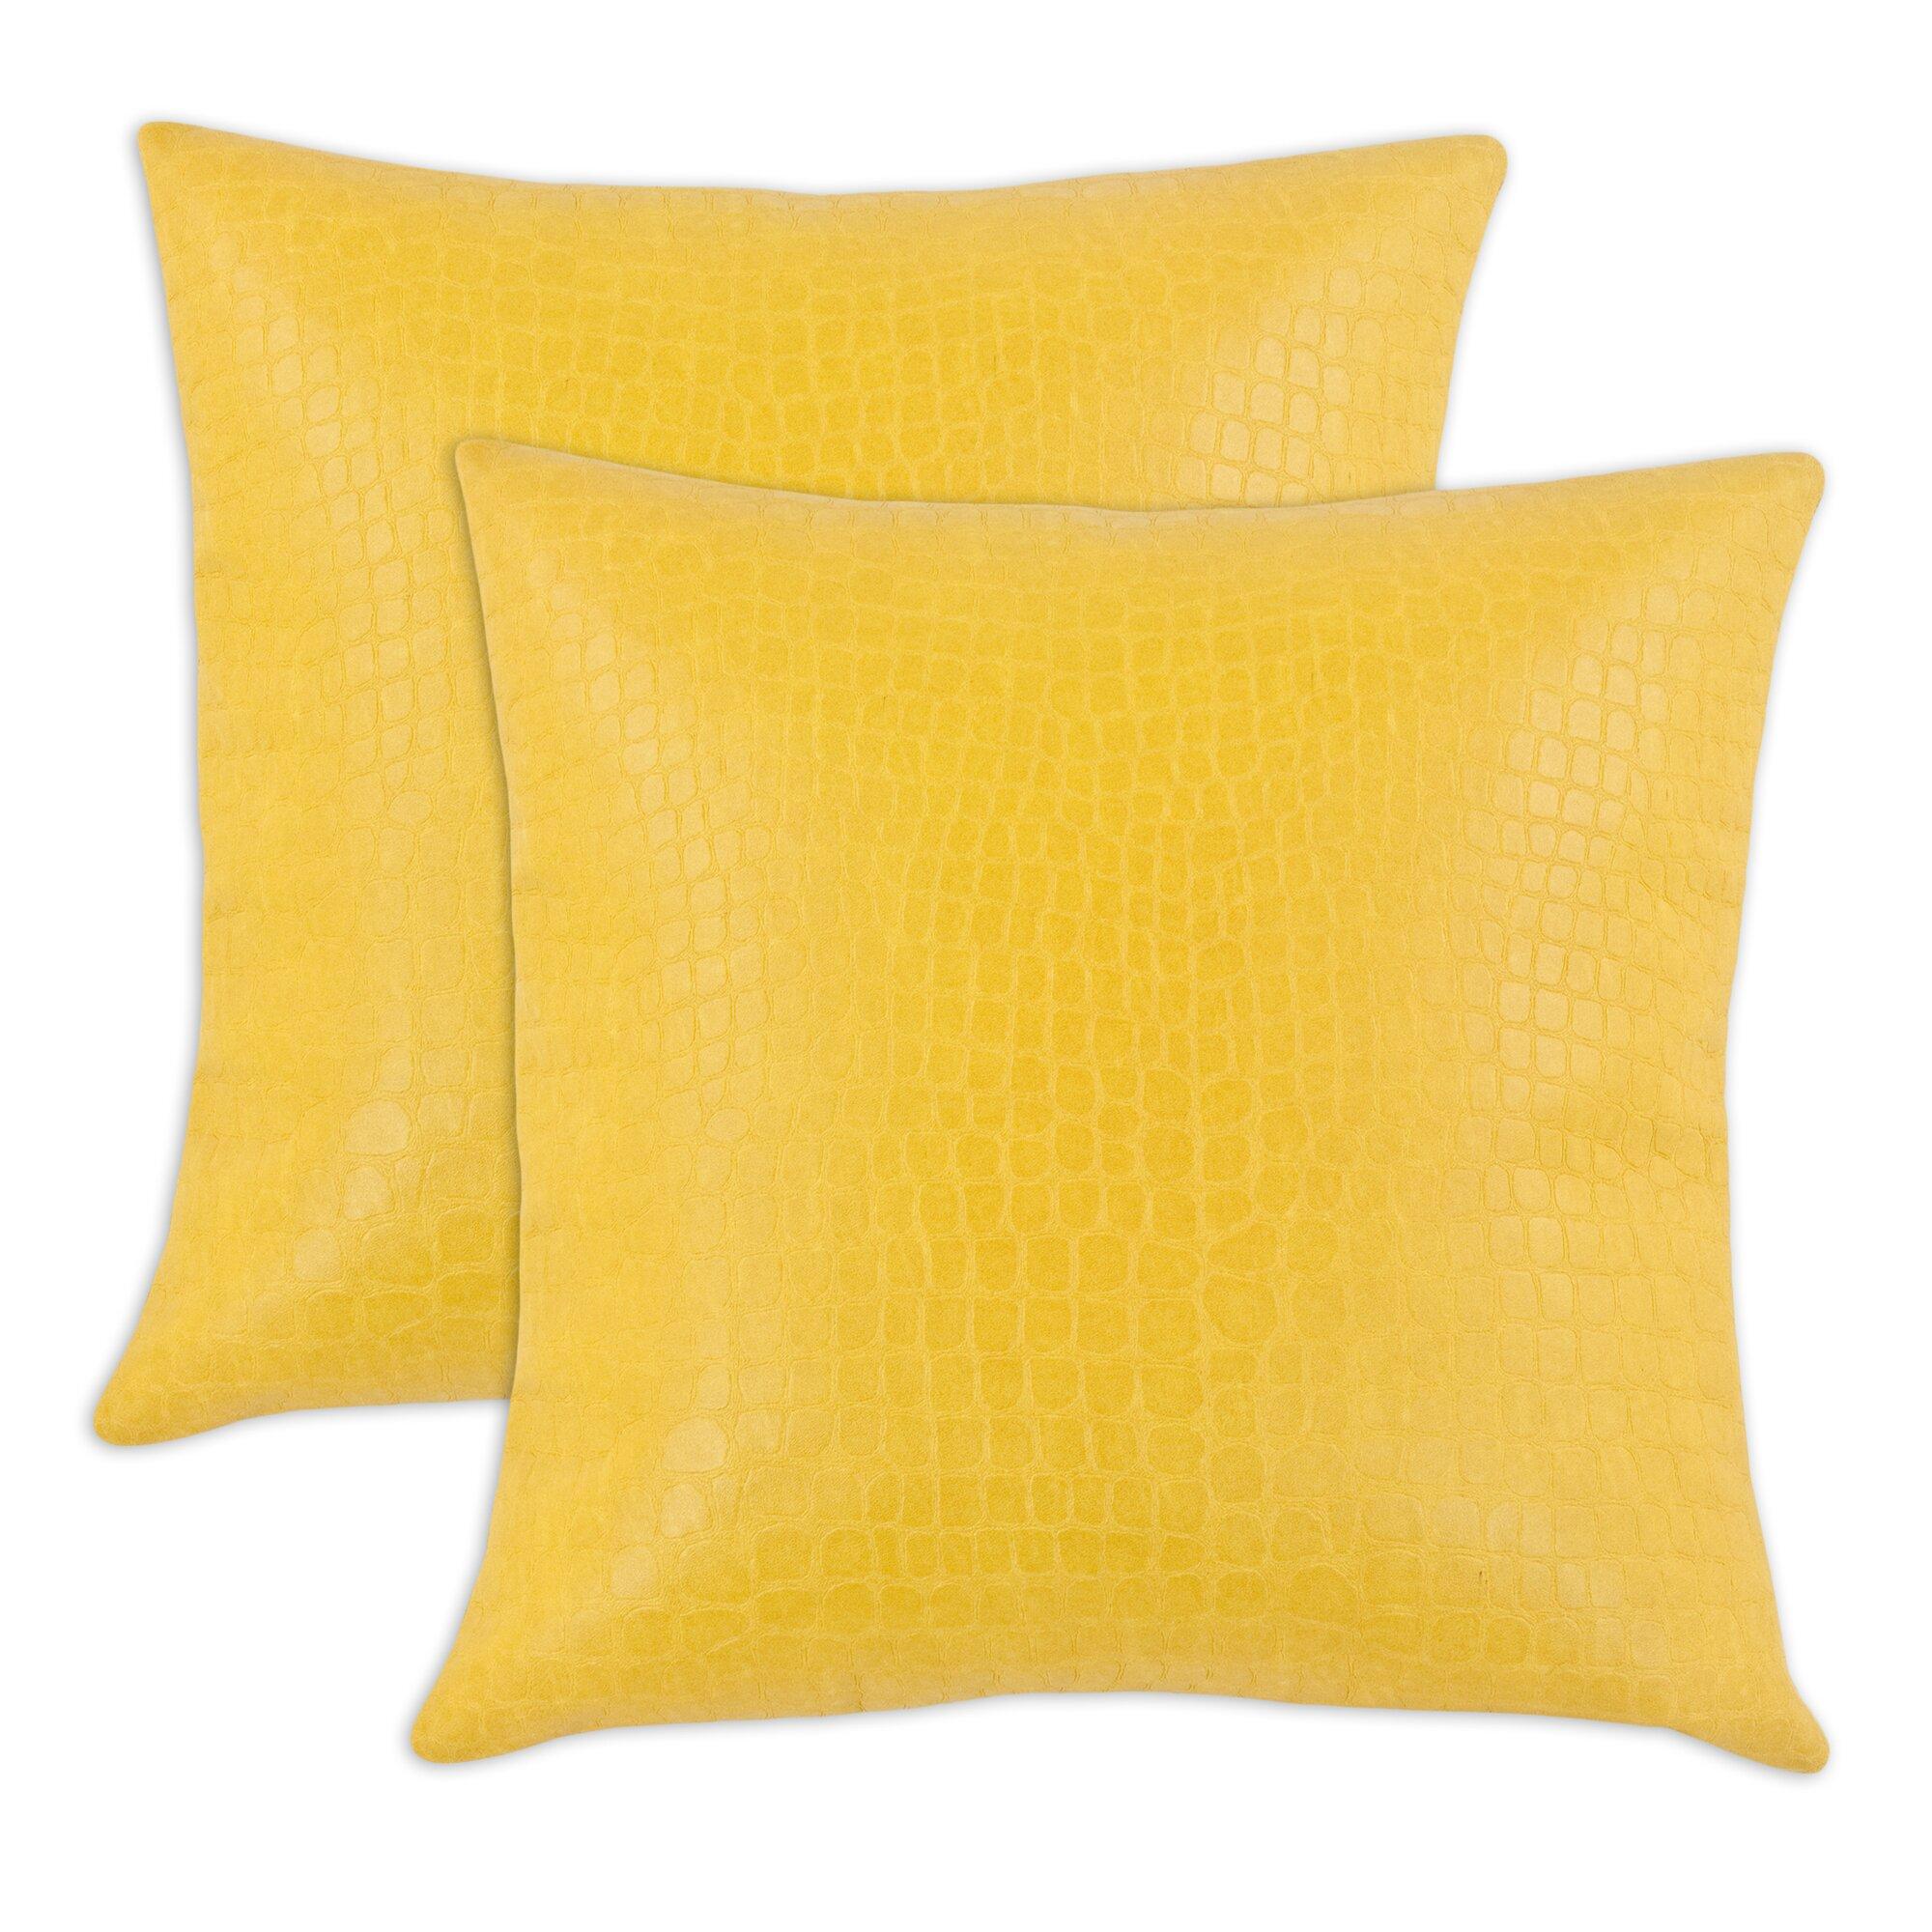 Brite Ideas Living Glade Runner KE Throw Pillow amp Reviews  : Glade Runner KE Fiber Polyester Throw Pillow pset17k6 from www.wayfair.com size 2000 x 2000 jpeg 860kB